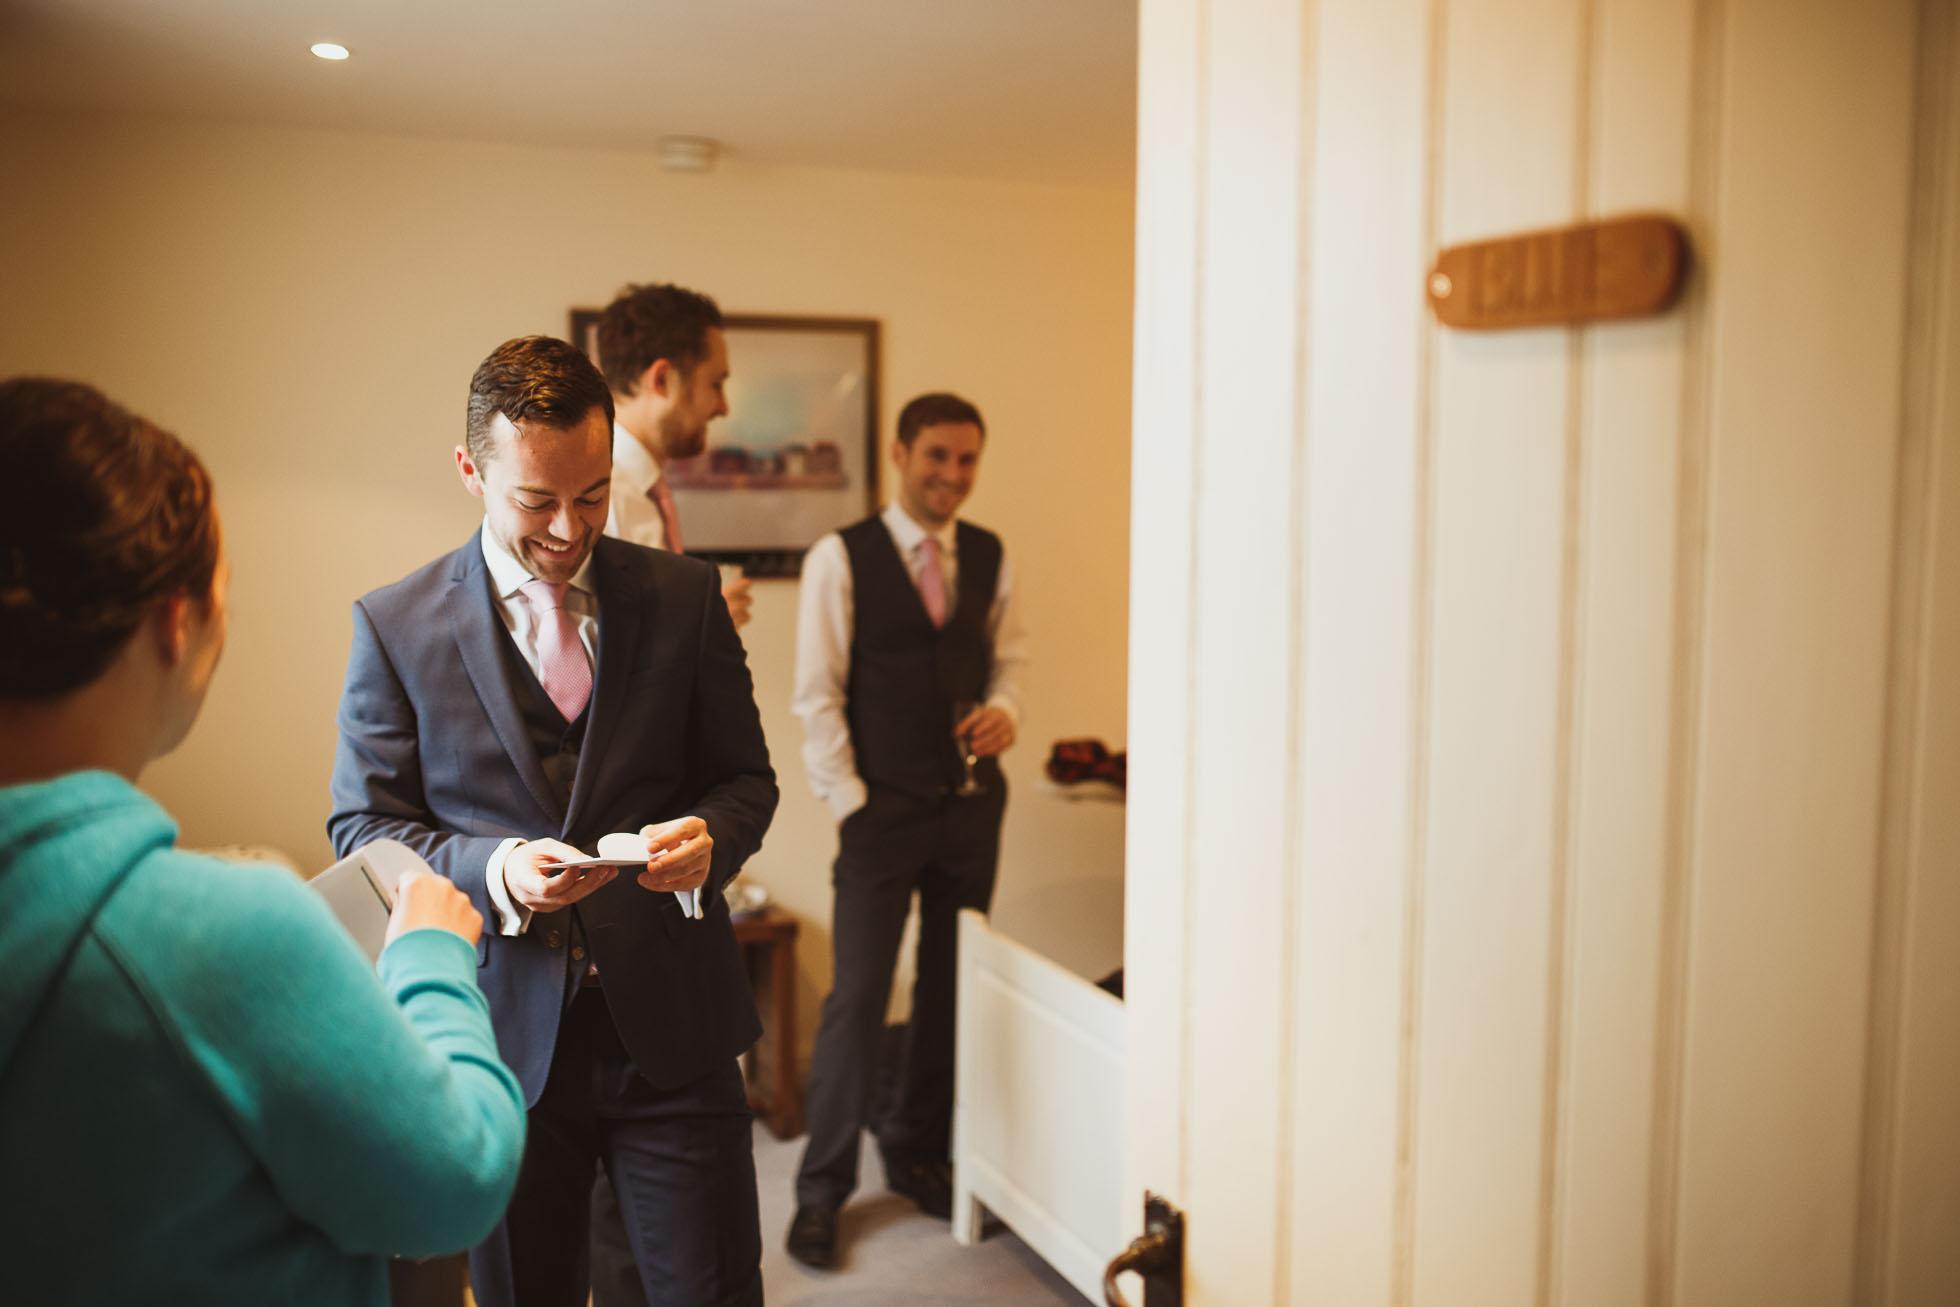 hilltop country house wedding photographer-10.jpg